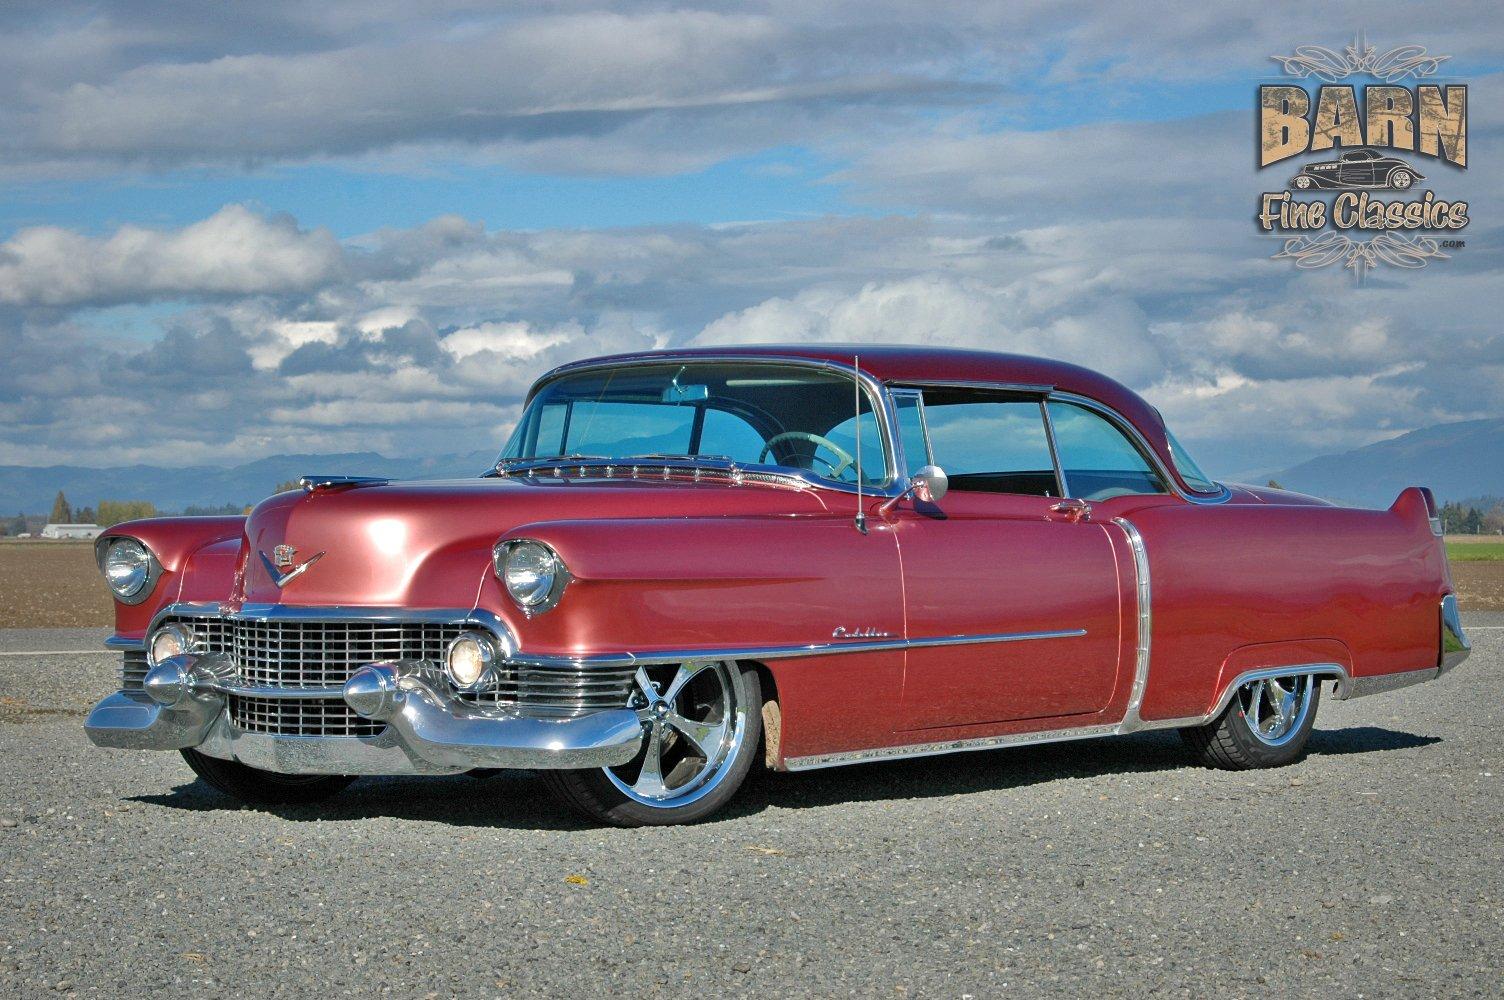 1954 Cadillac Series 62 Coupe Hardtop Hotrod Streetrod Hot